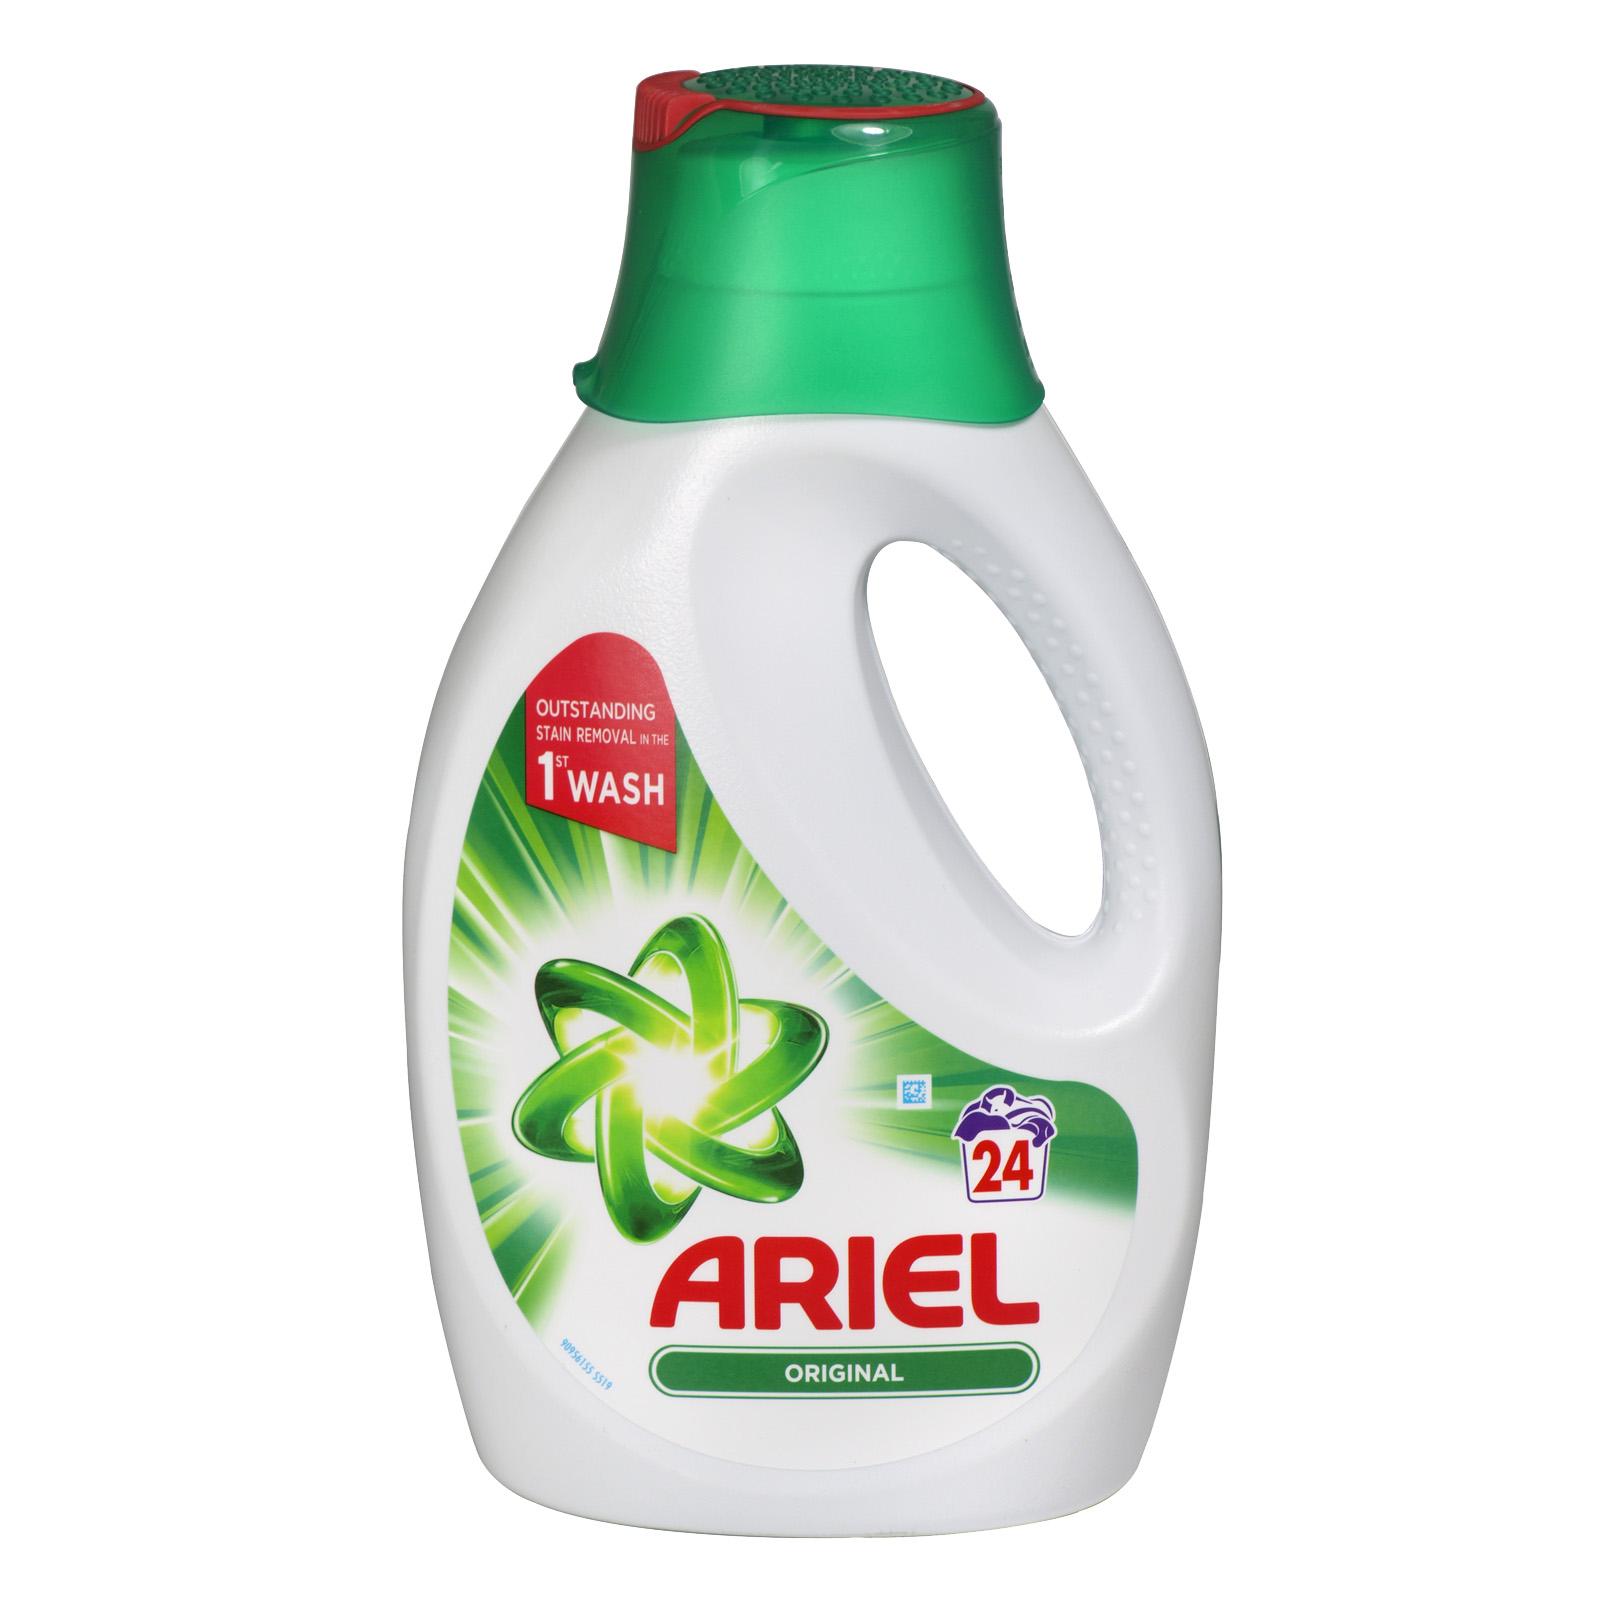 ARIEL LIQUID 24 WASH BIO